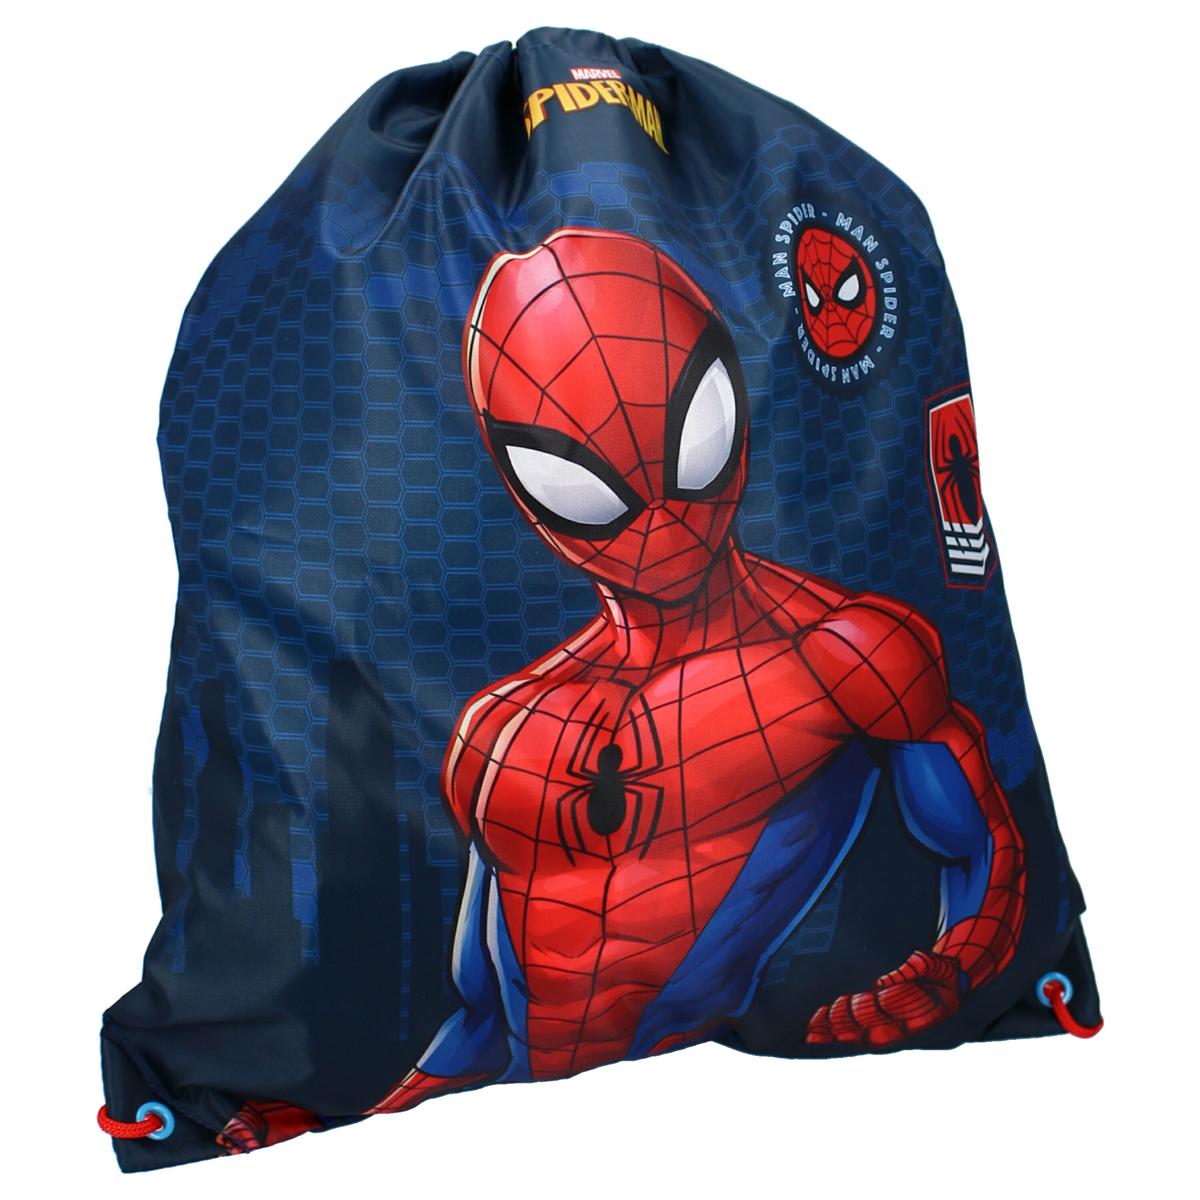 Sac piscine \'Spiderman\' bleu rouge - 44x37 cm - [A3047]